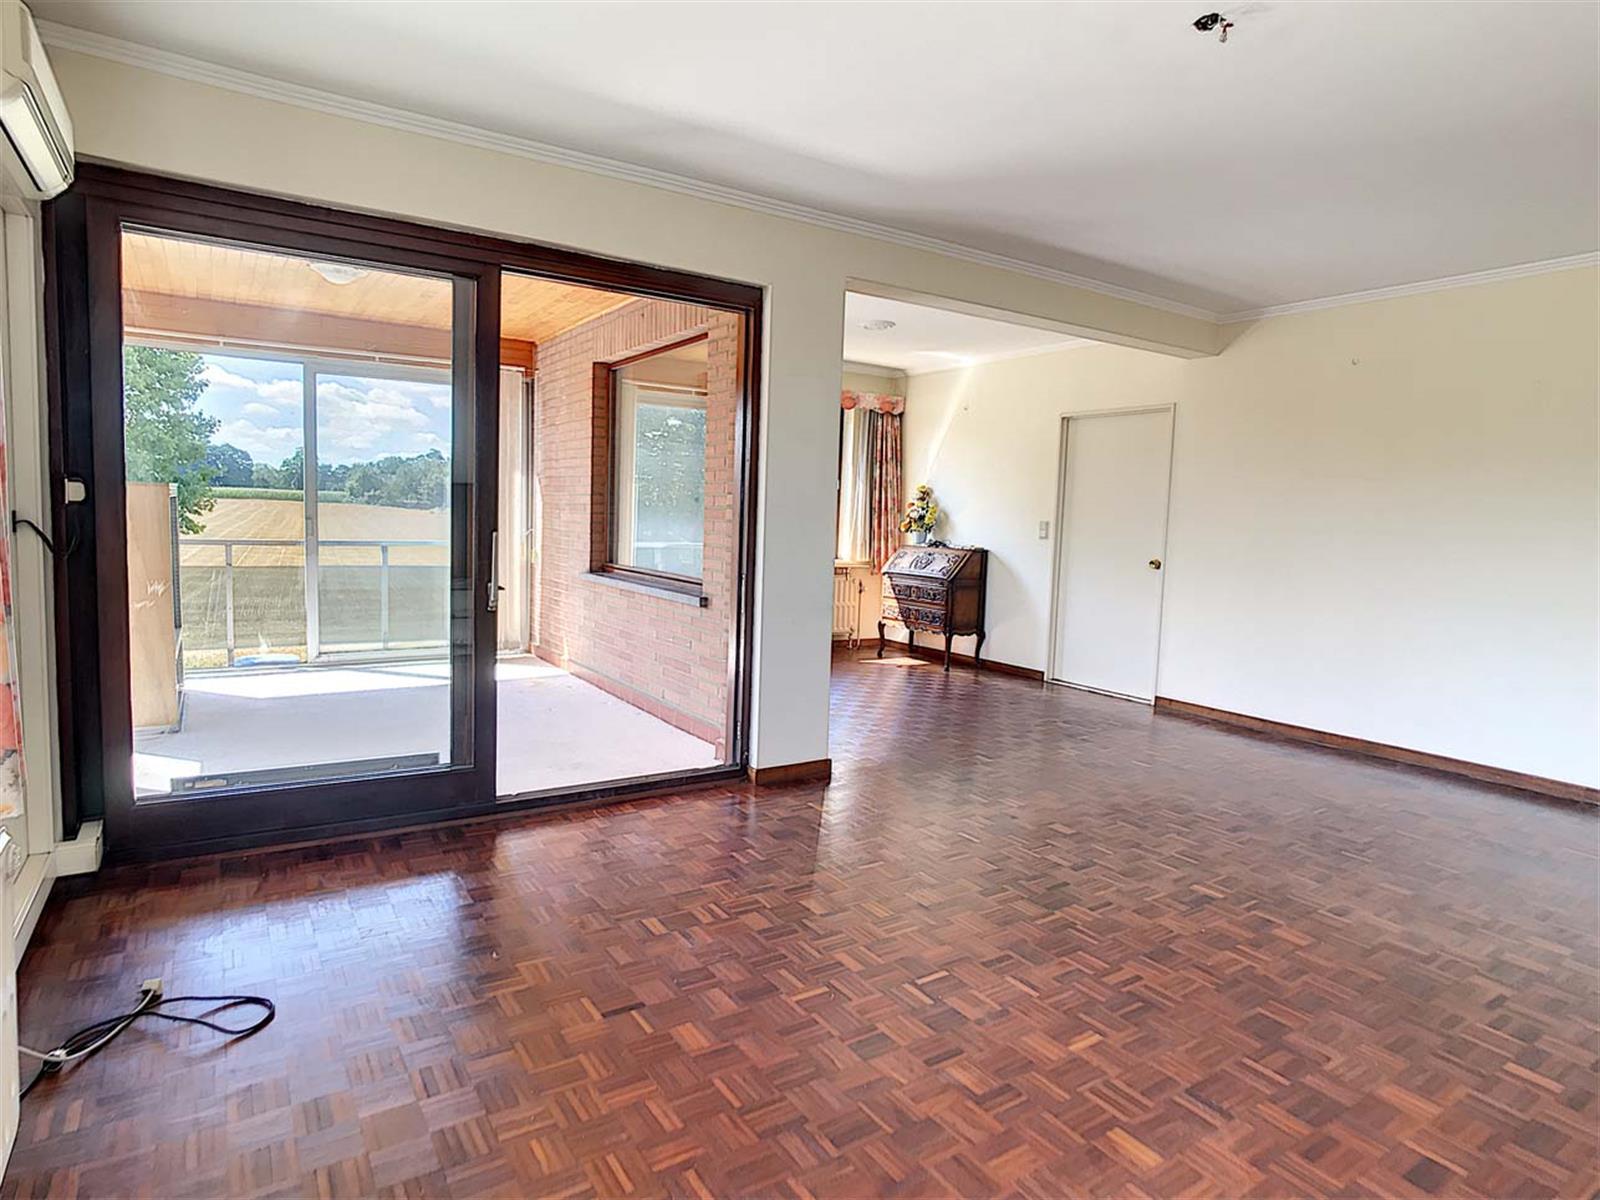 Appartement - Kraainem - #4162574-2